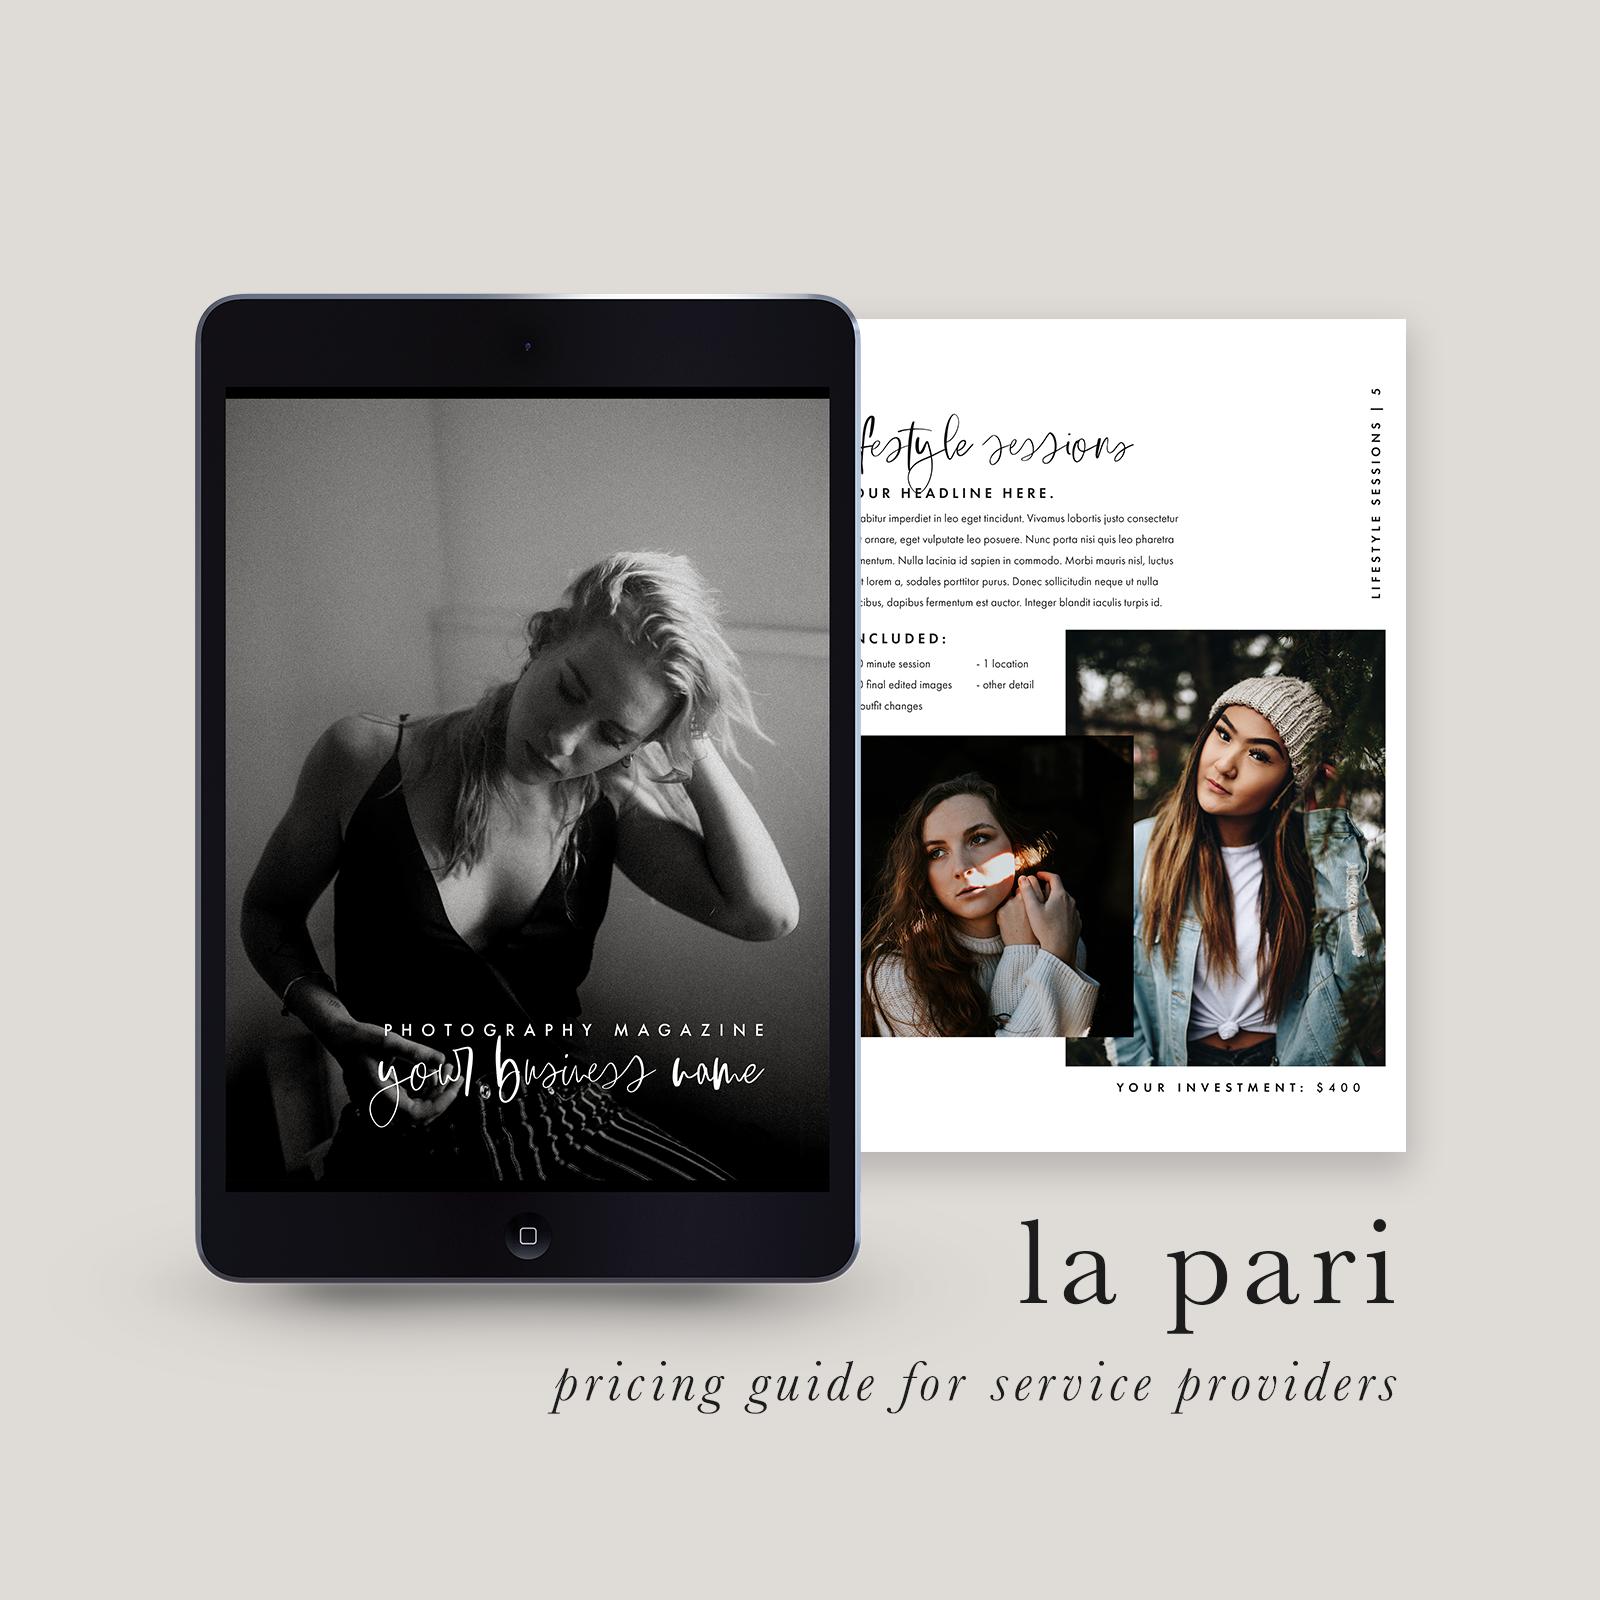 branding-and-design-for-female-entrepreneurs-and-photographers